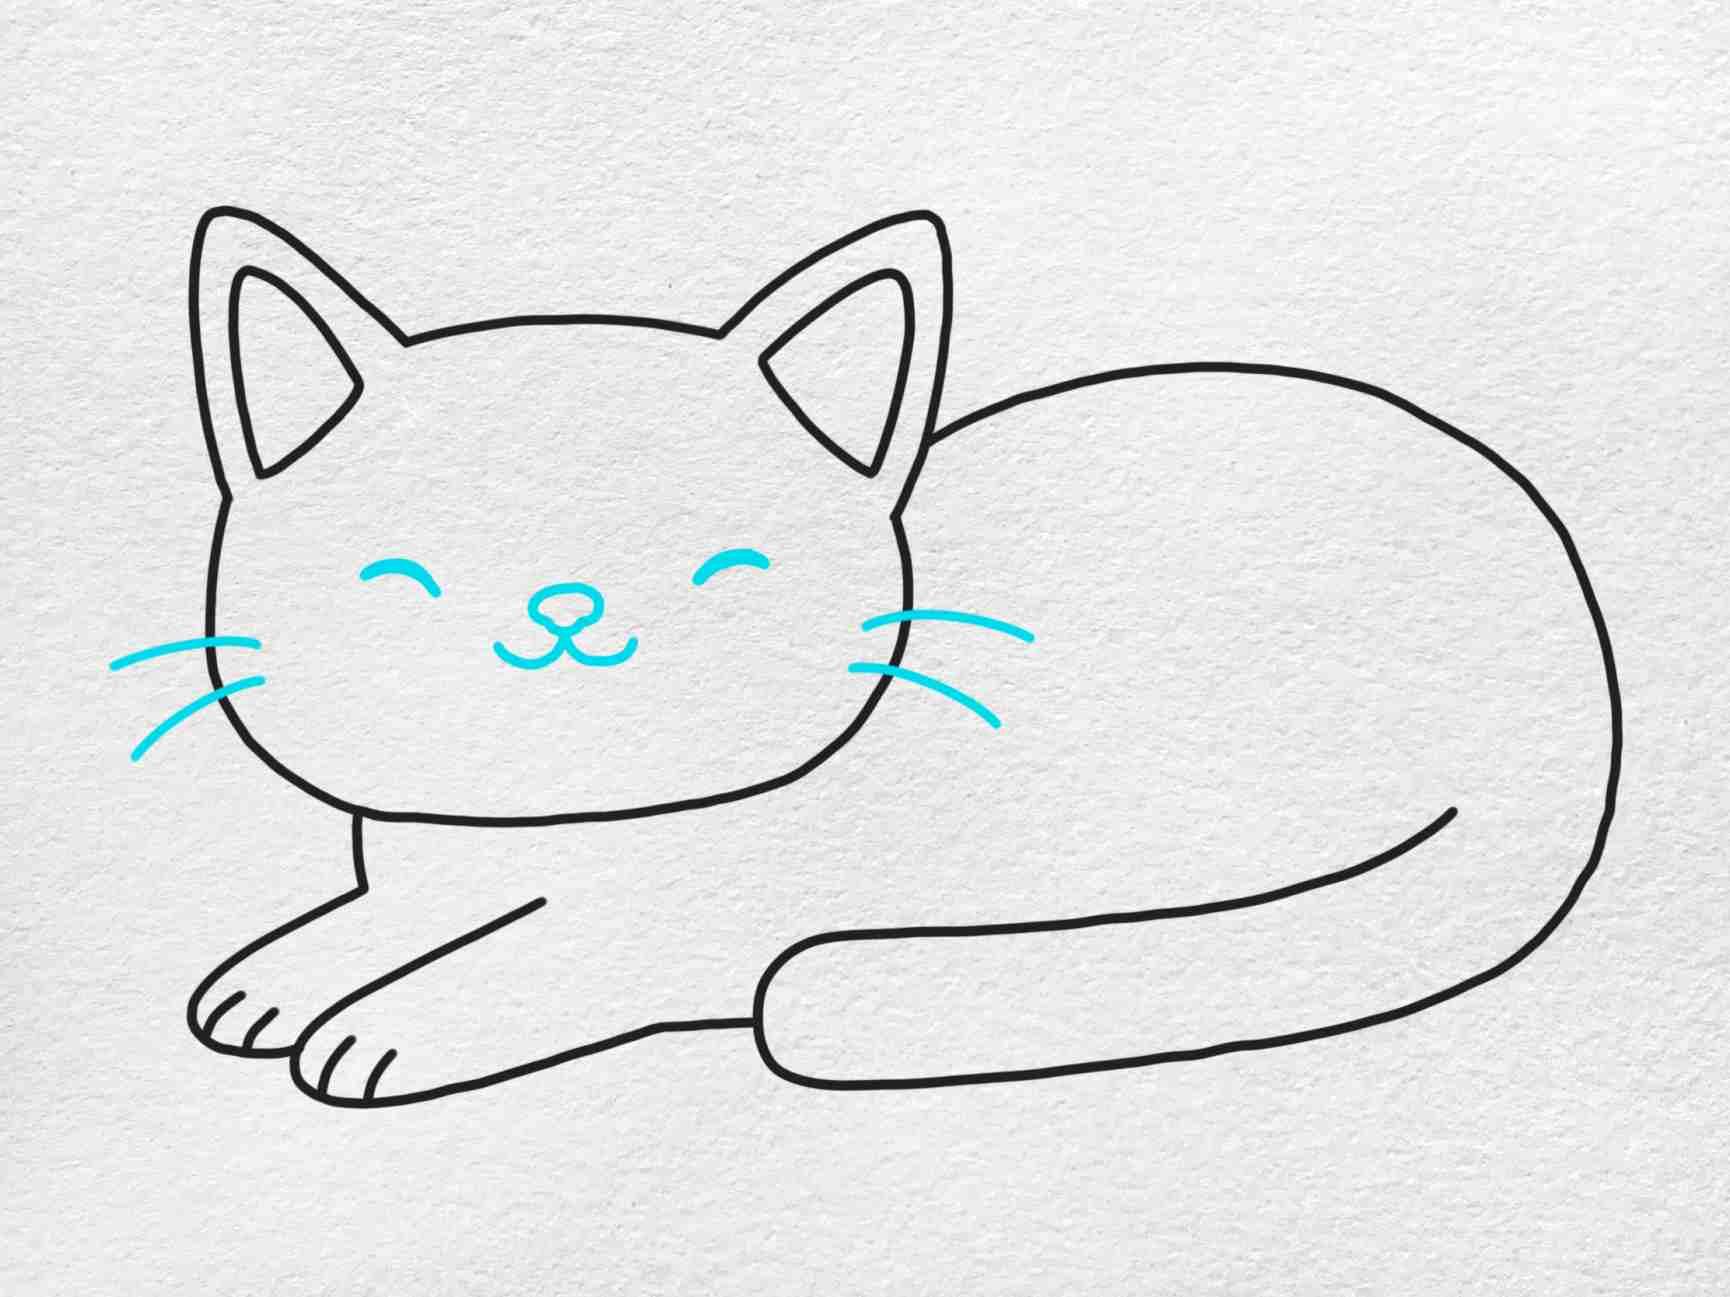 Fat Cat Drawing: Step 5